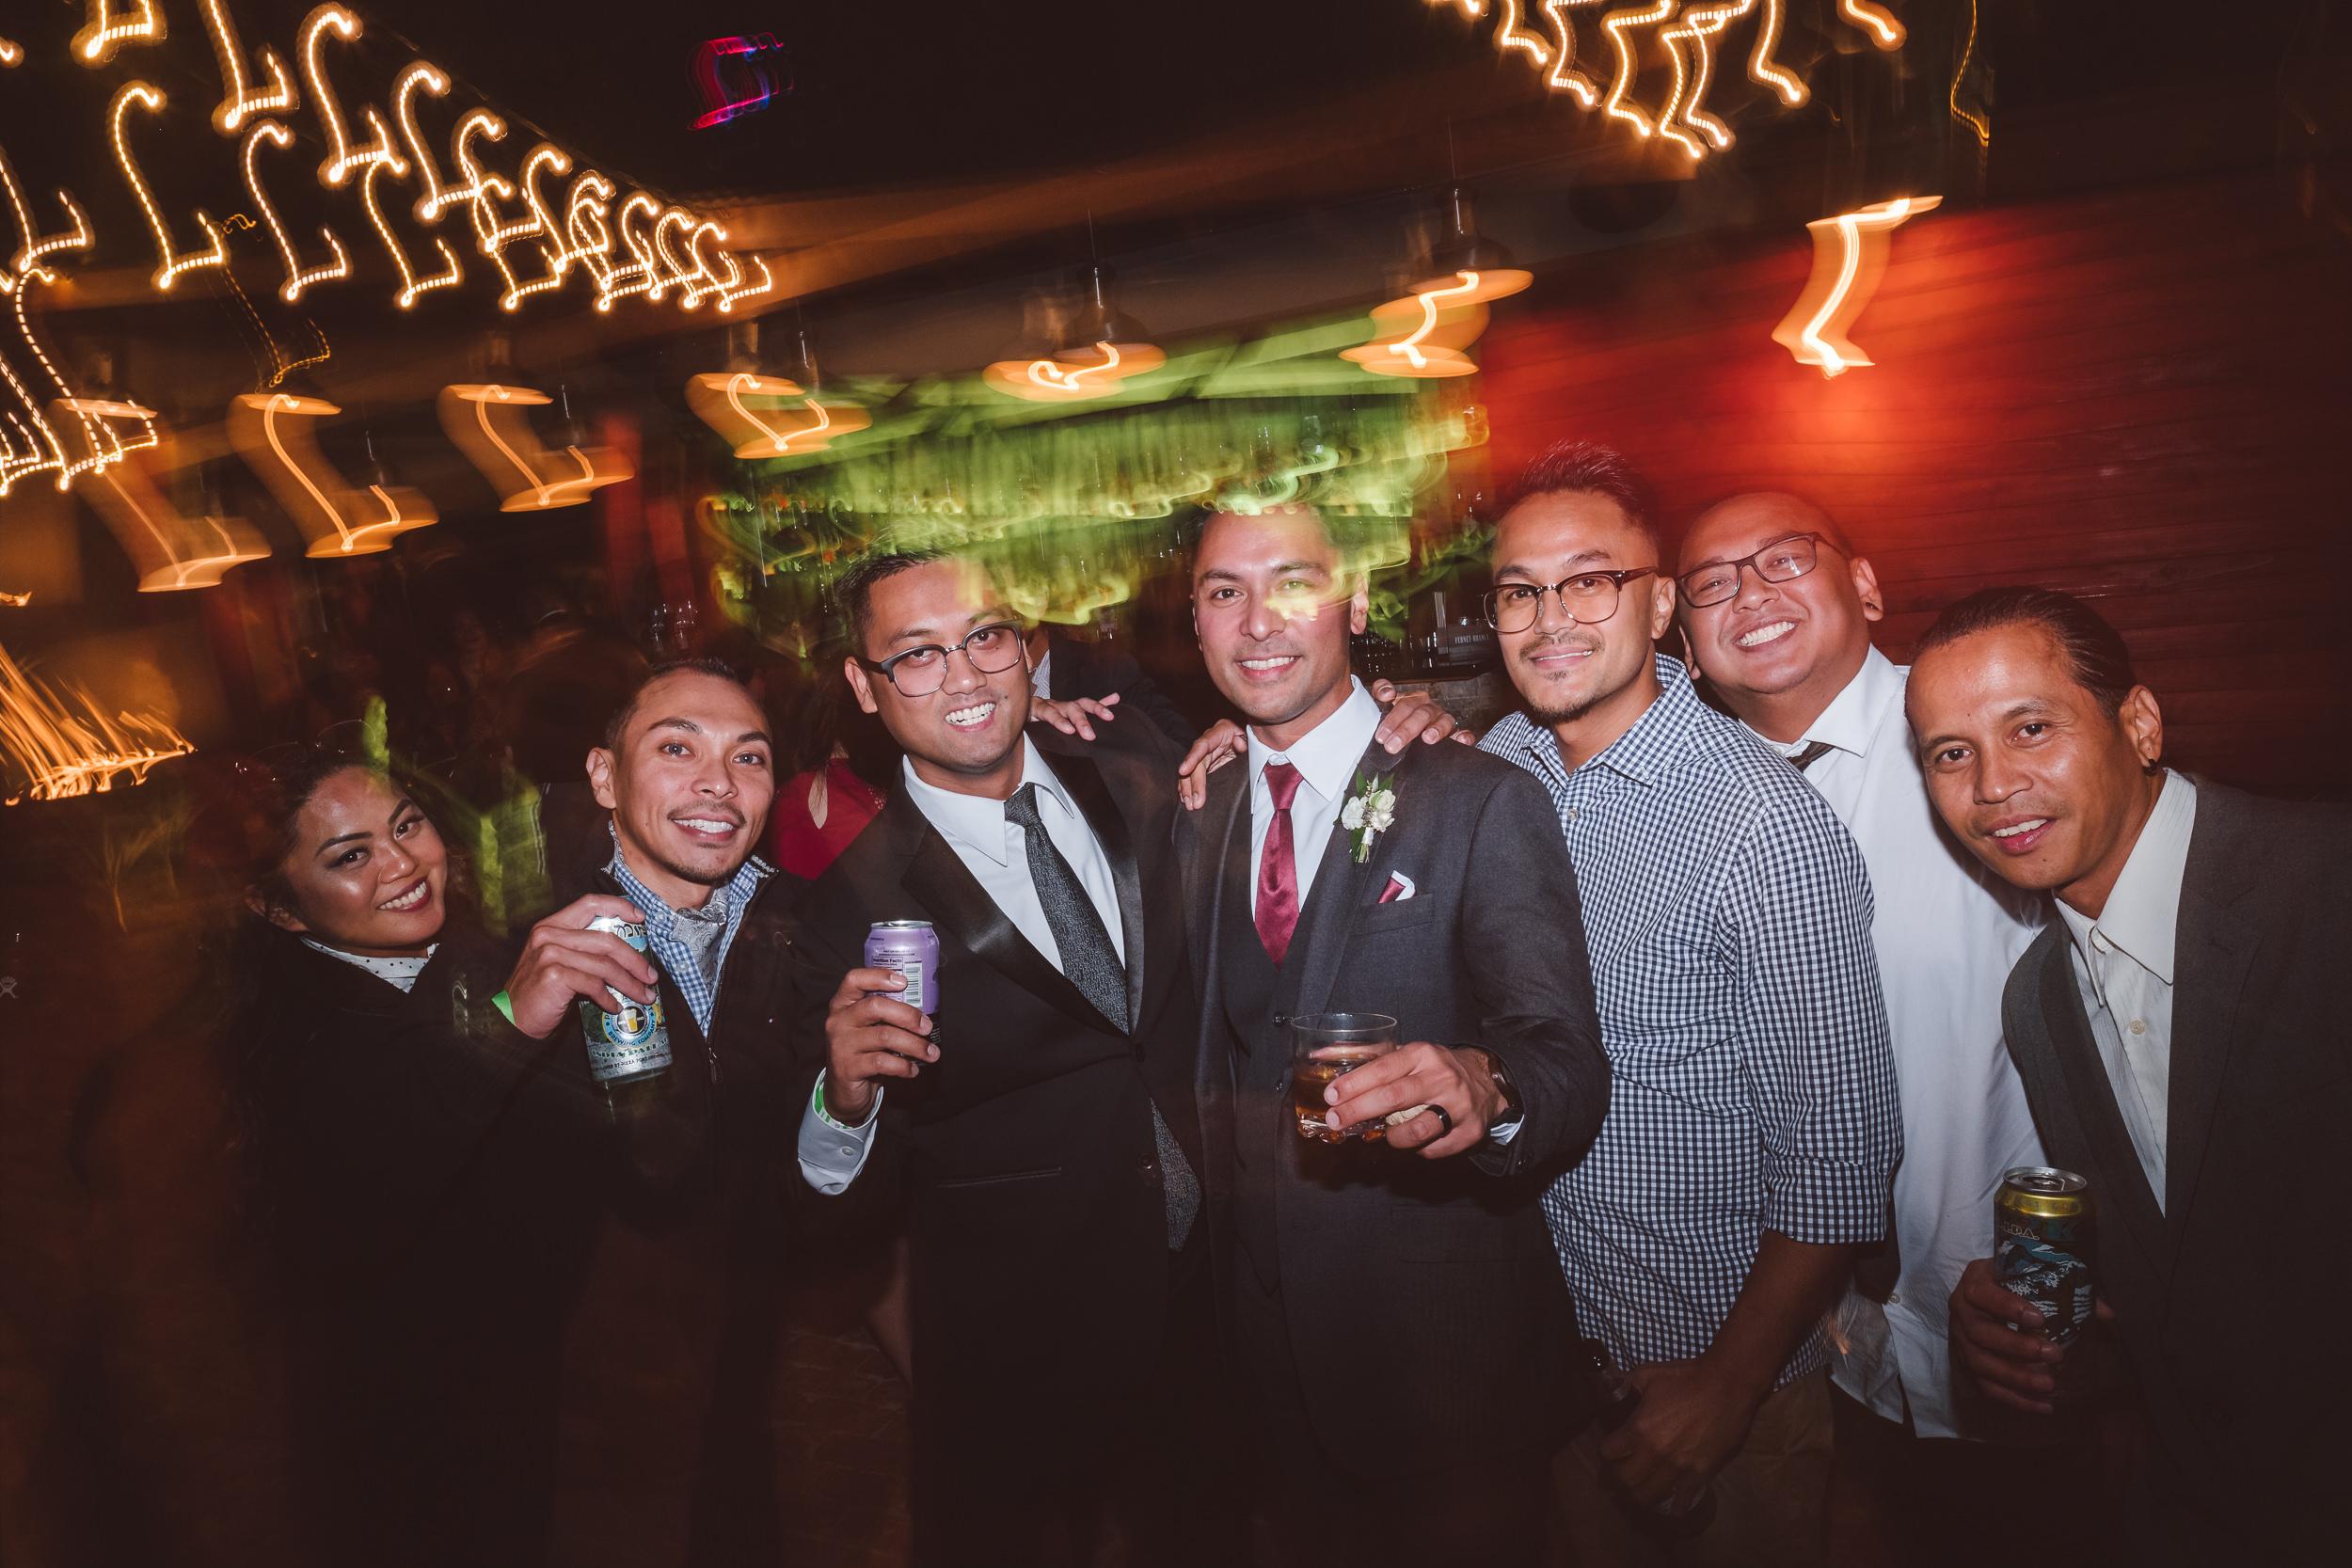 San-Francisco-City-Hall-Wedding-Photography-096.jpg